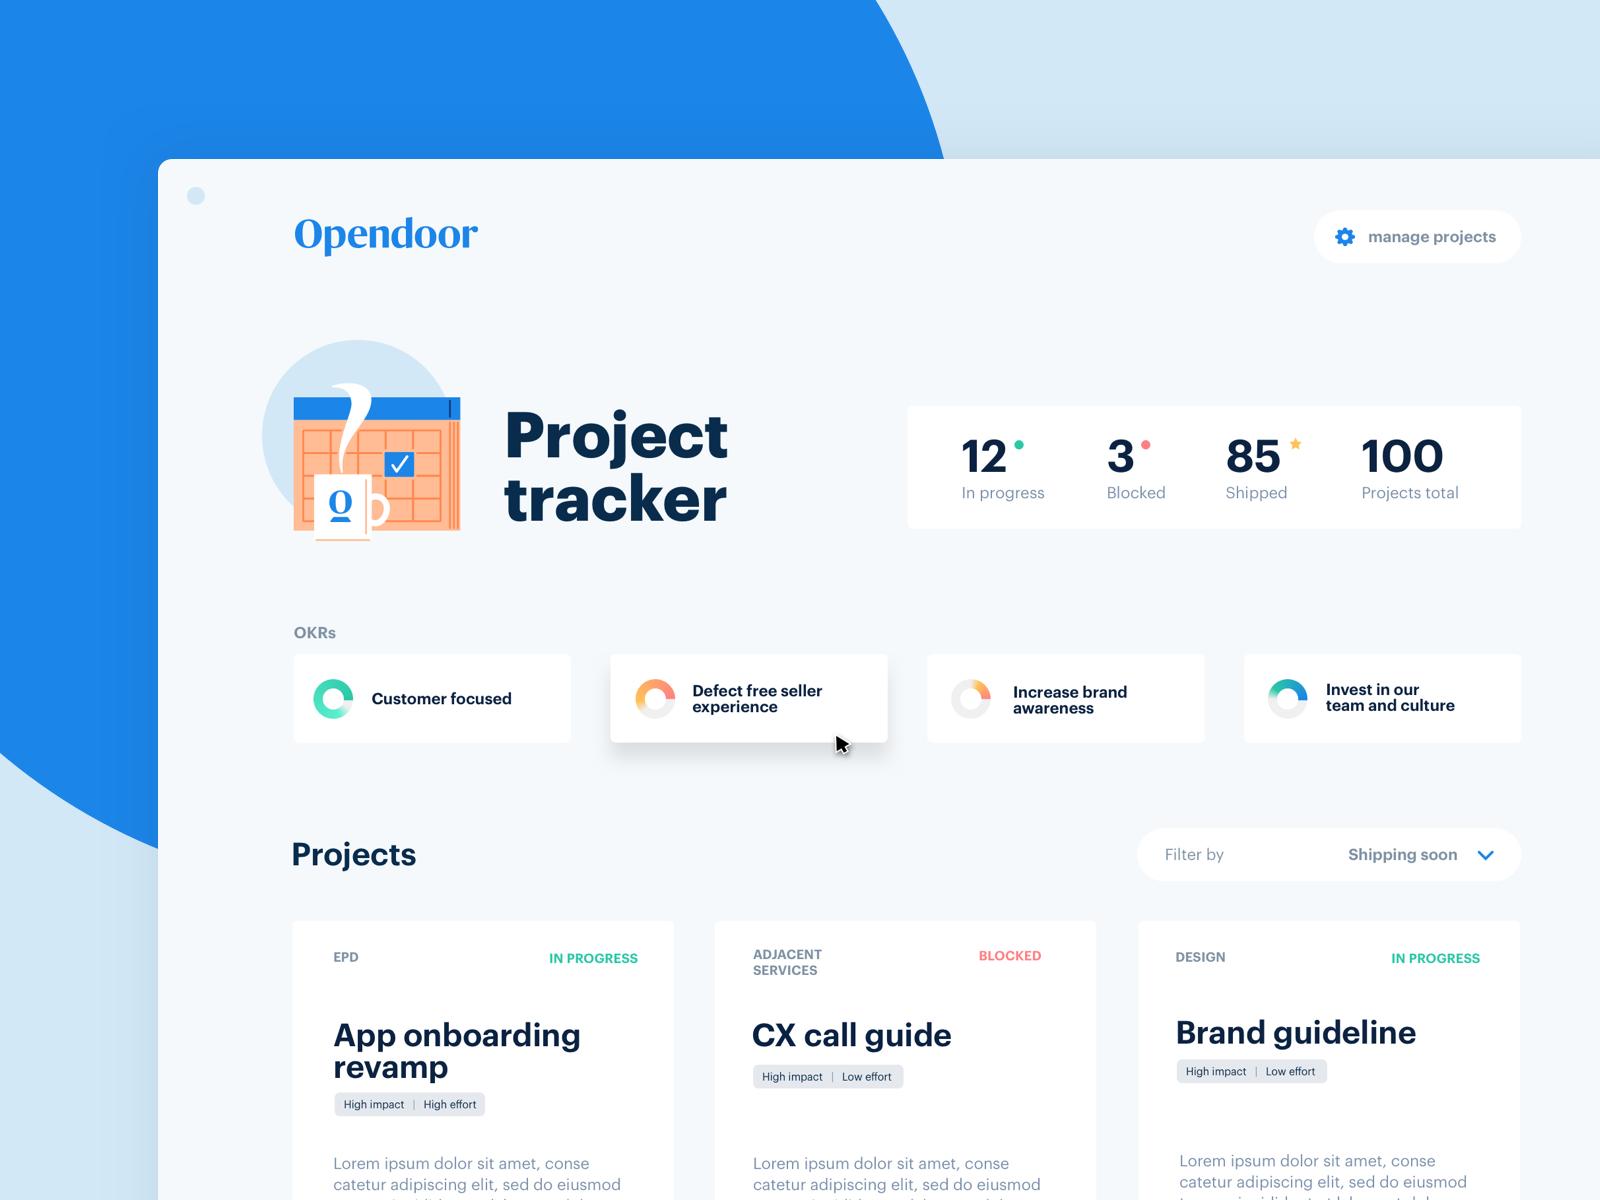 Project tracker dashboard